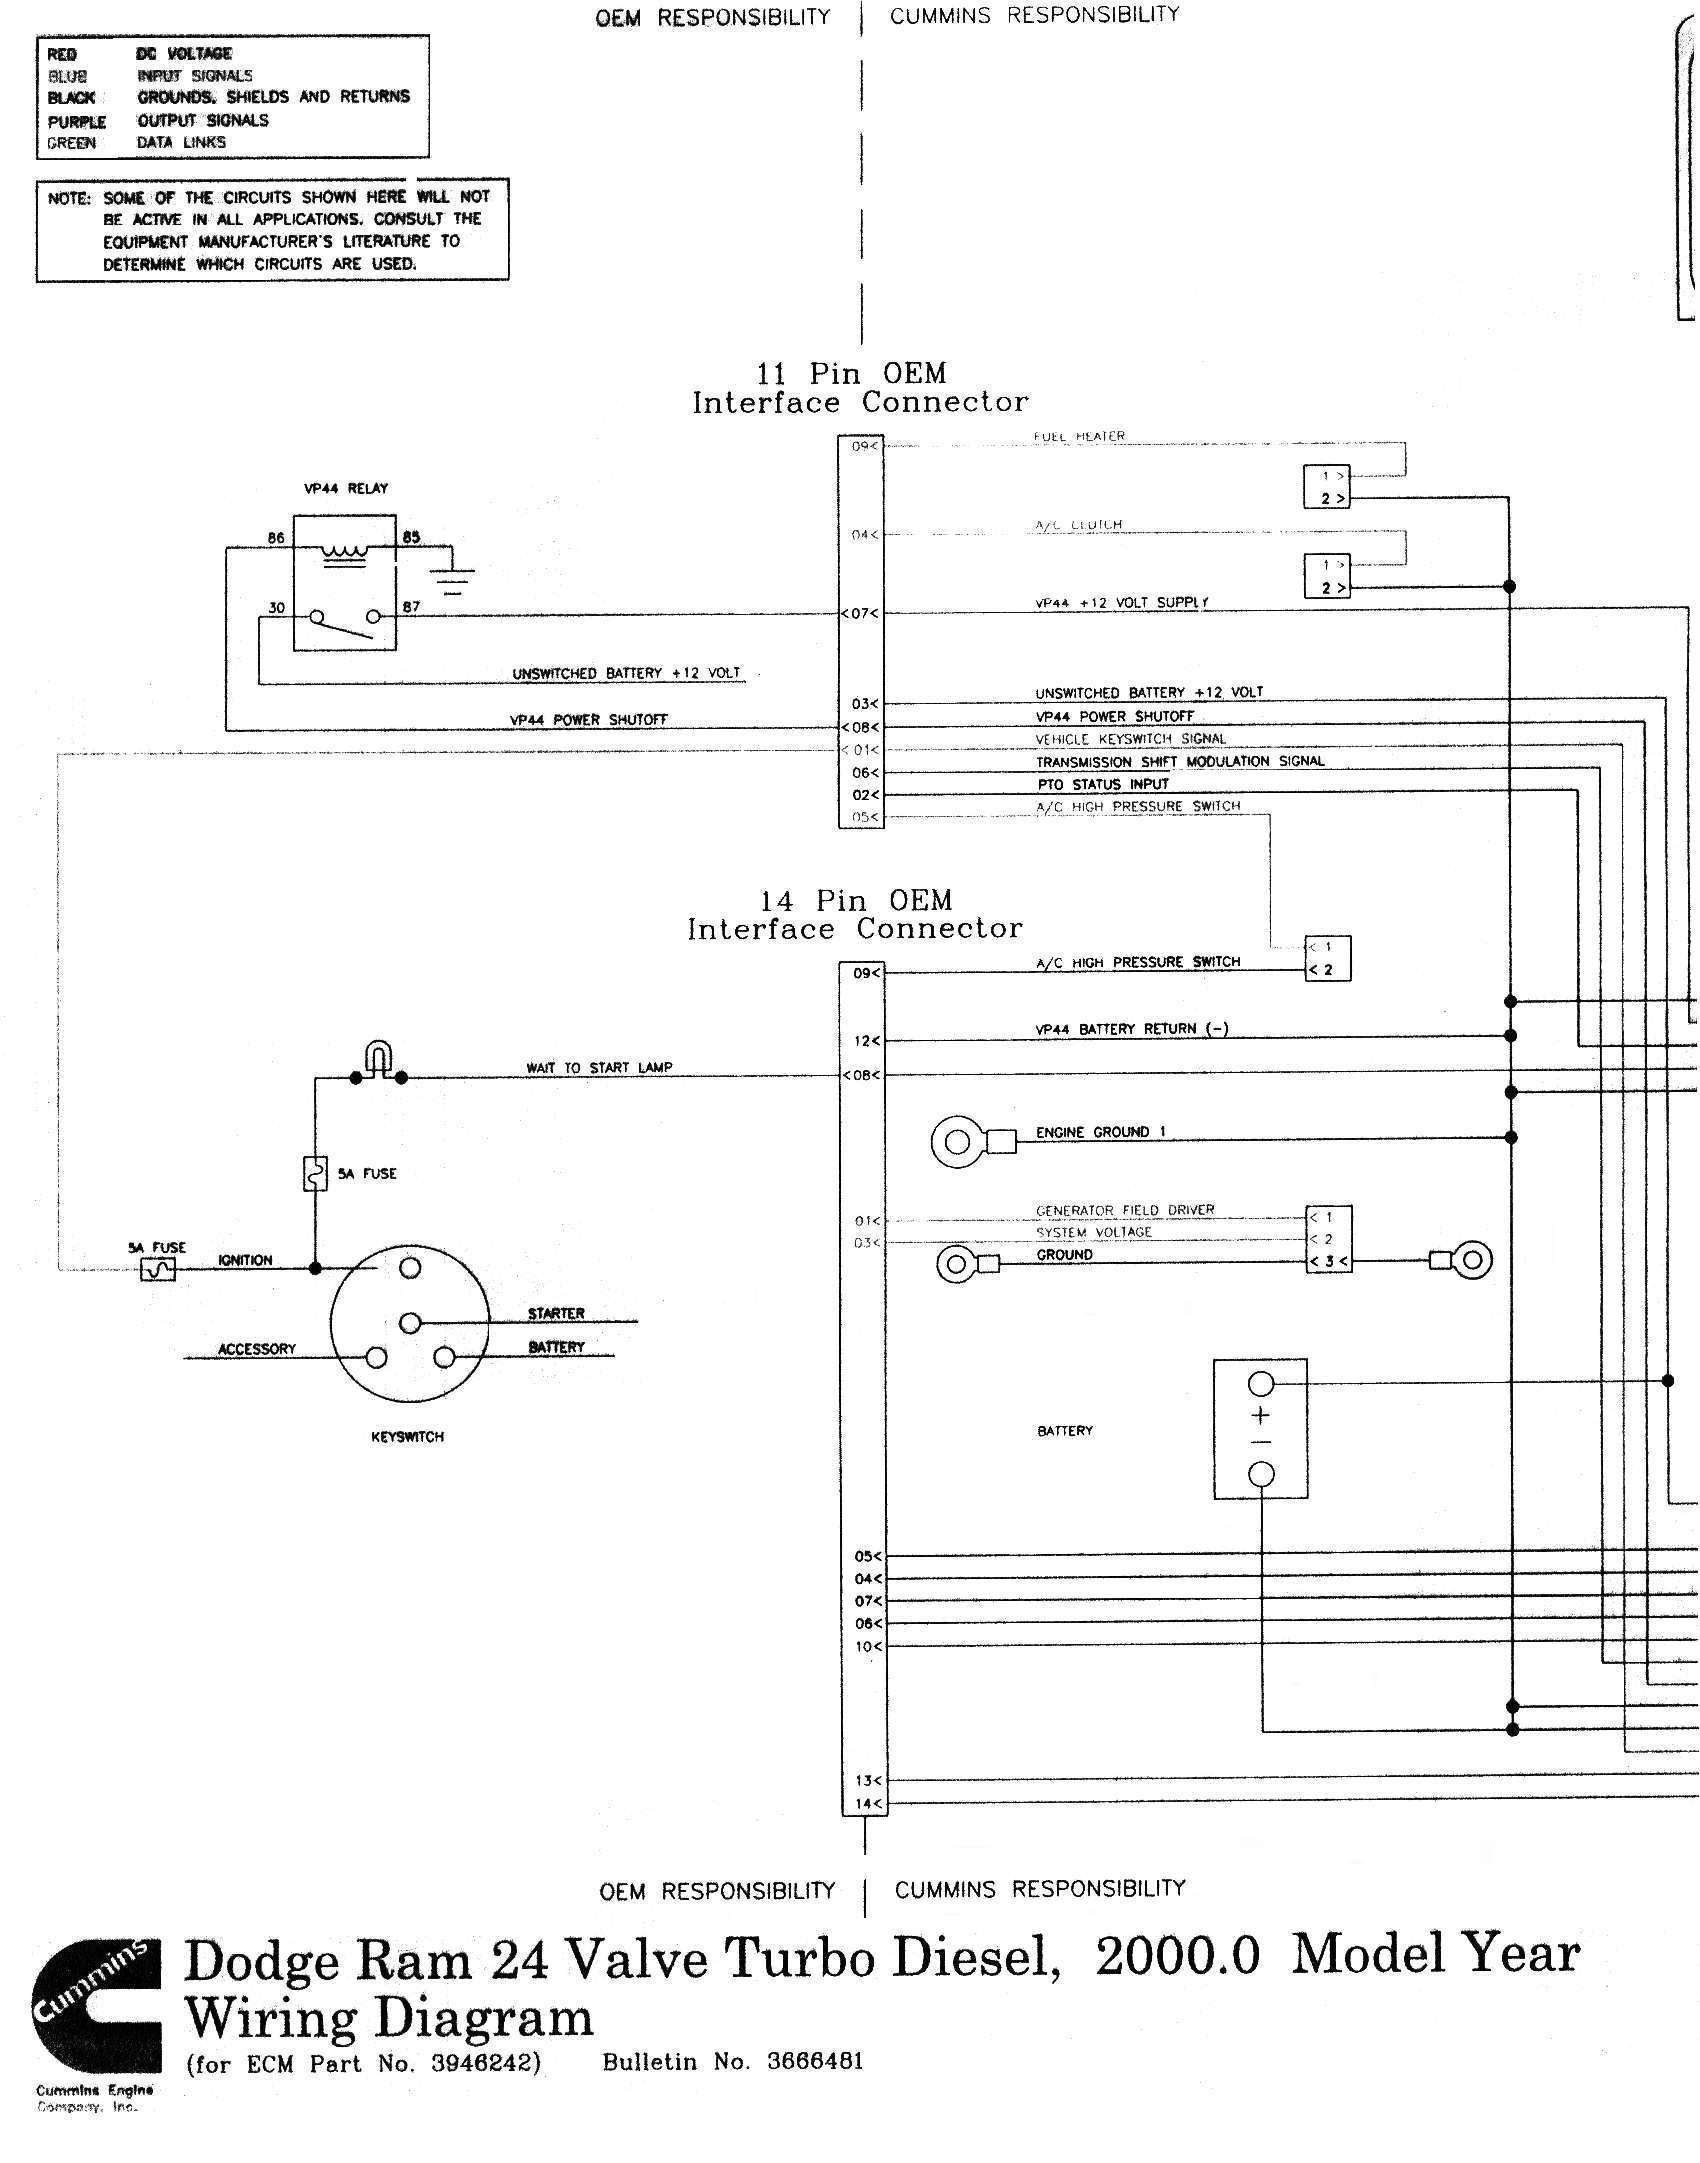 2001 dodge ram 1500 pcm wiring diagram Download-Wiring Diagram 2007 Dodge Ram 1500 Best Ecm Details For 1998 2002 16-r